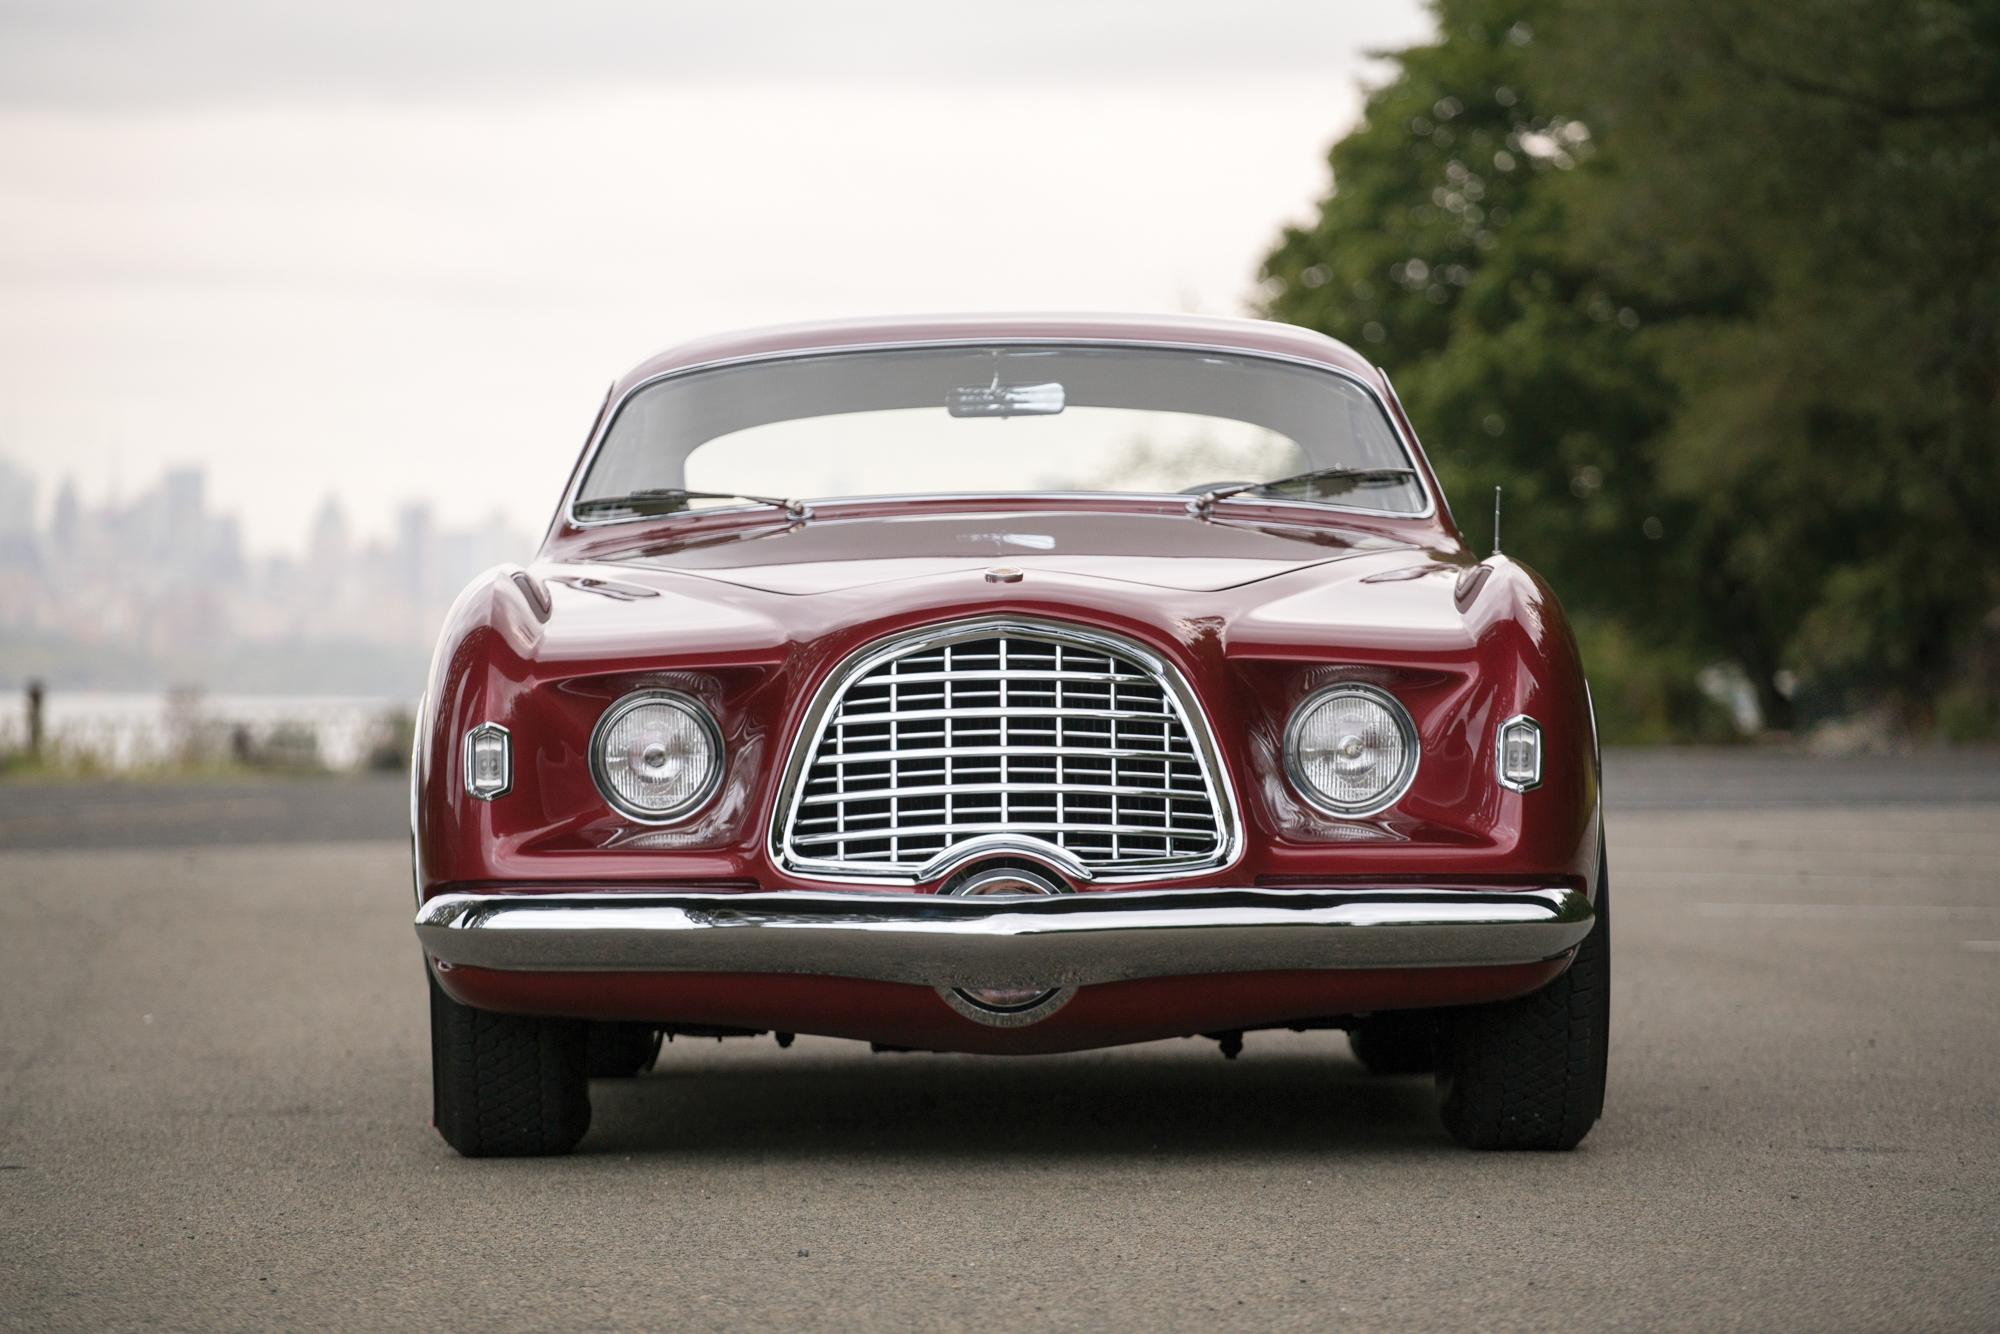 1952 Chrysler D'Elegance by Ghia front